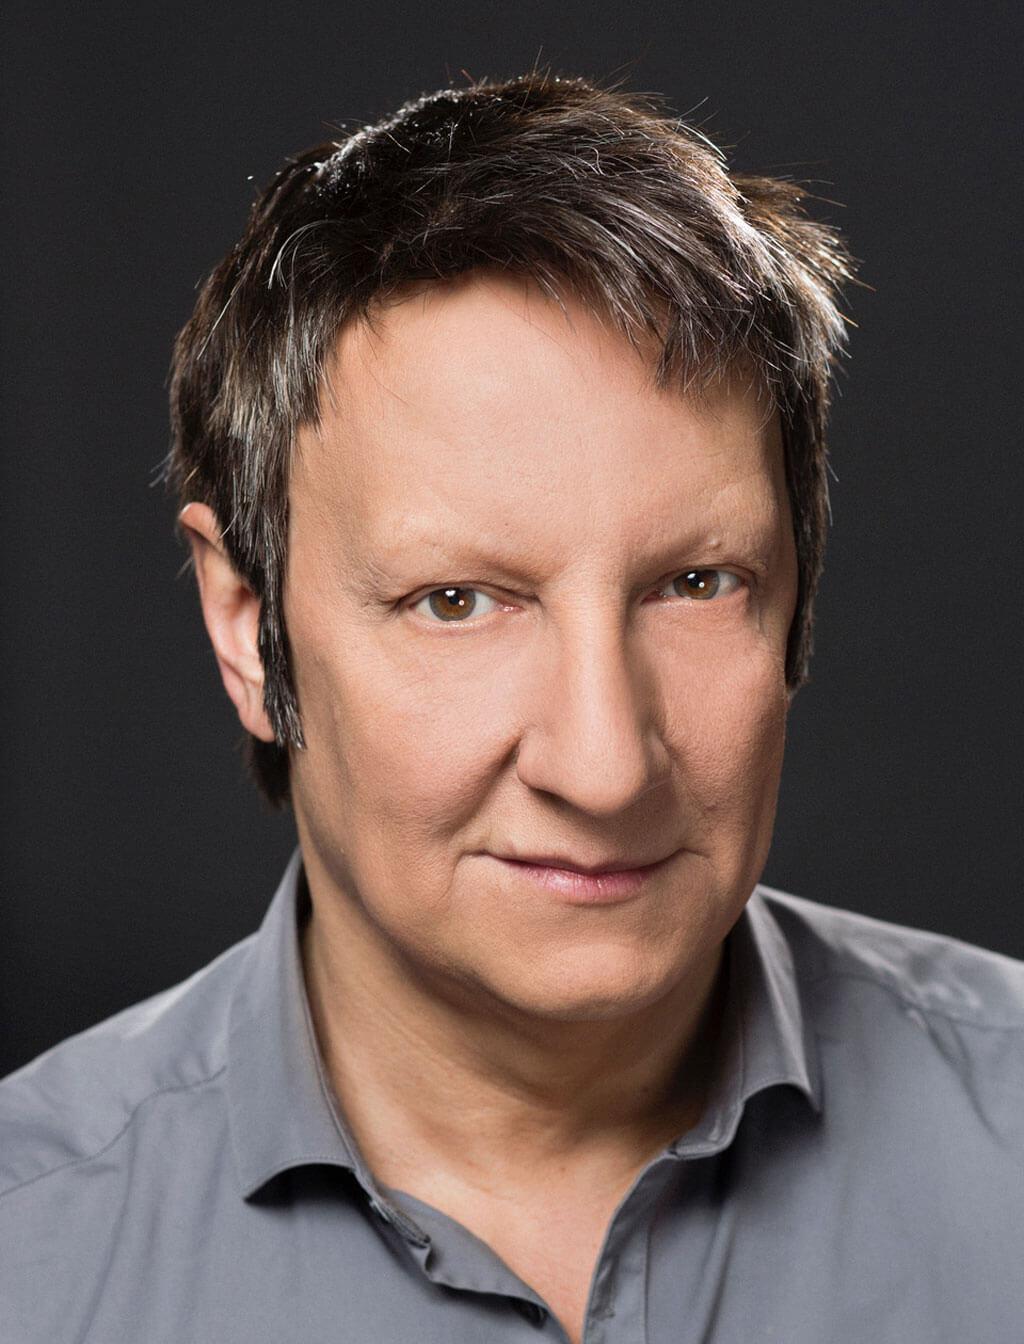 Robert Lepage (Crédit: Jocelyn Michel)